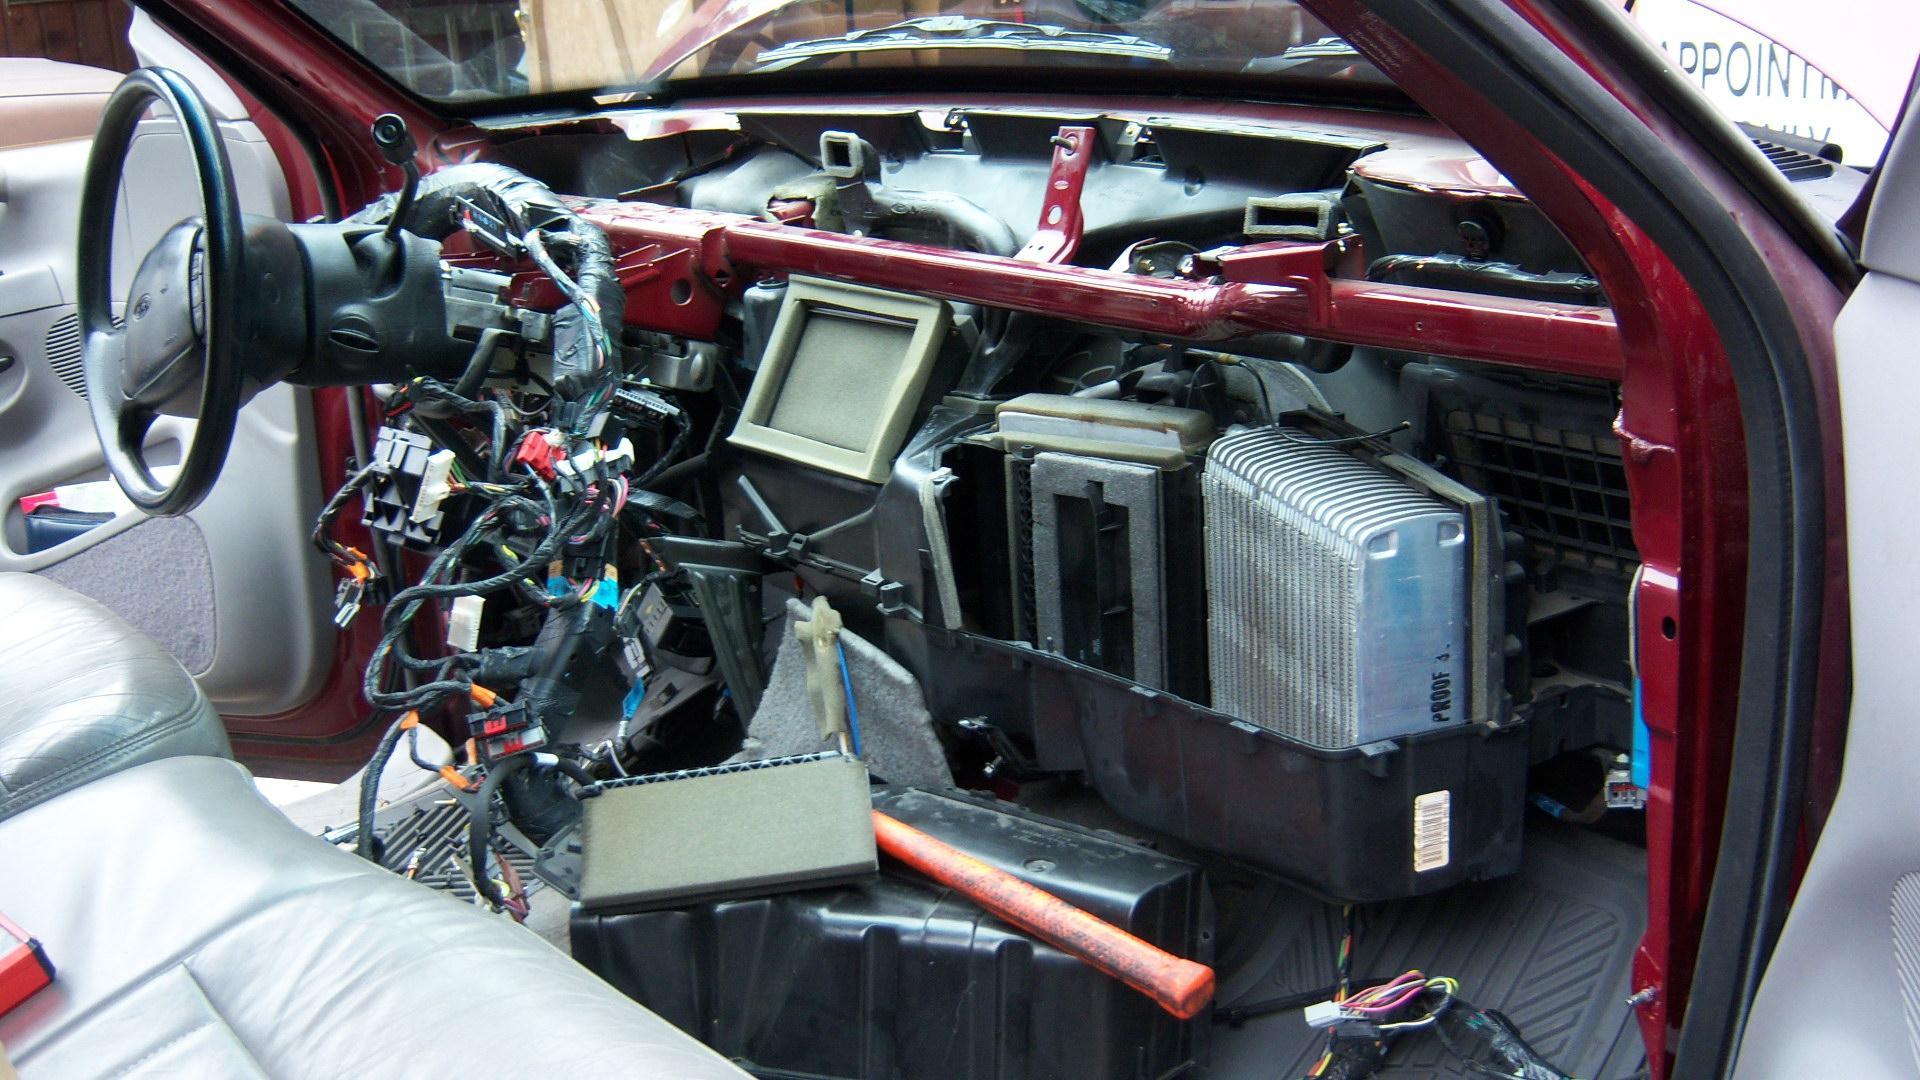 Daniel Rogers Auto Repair In Camano Island Wa 98282